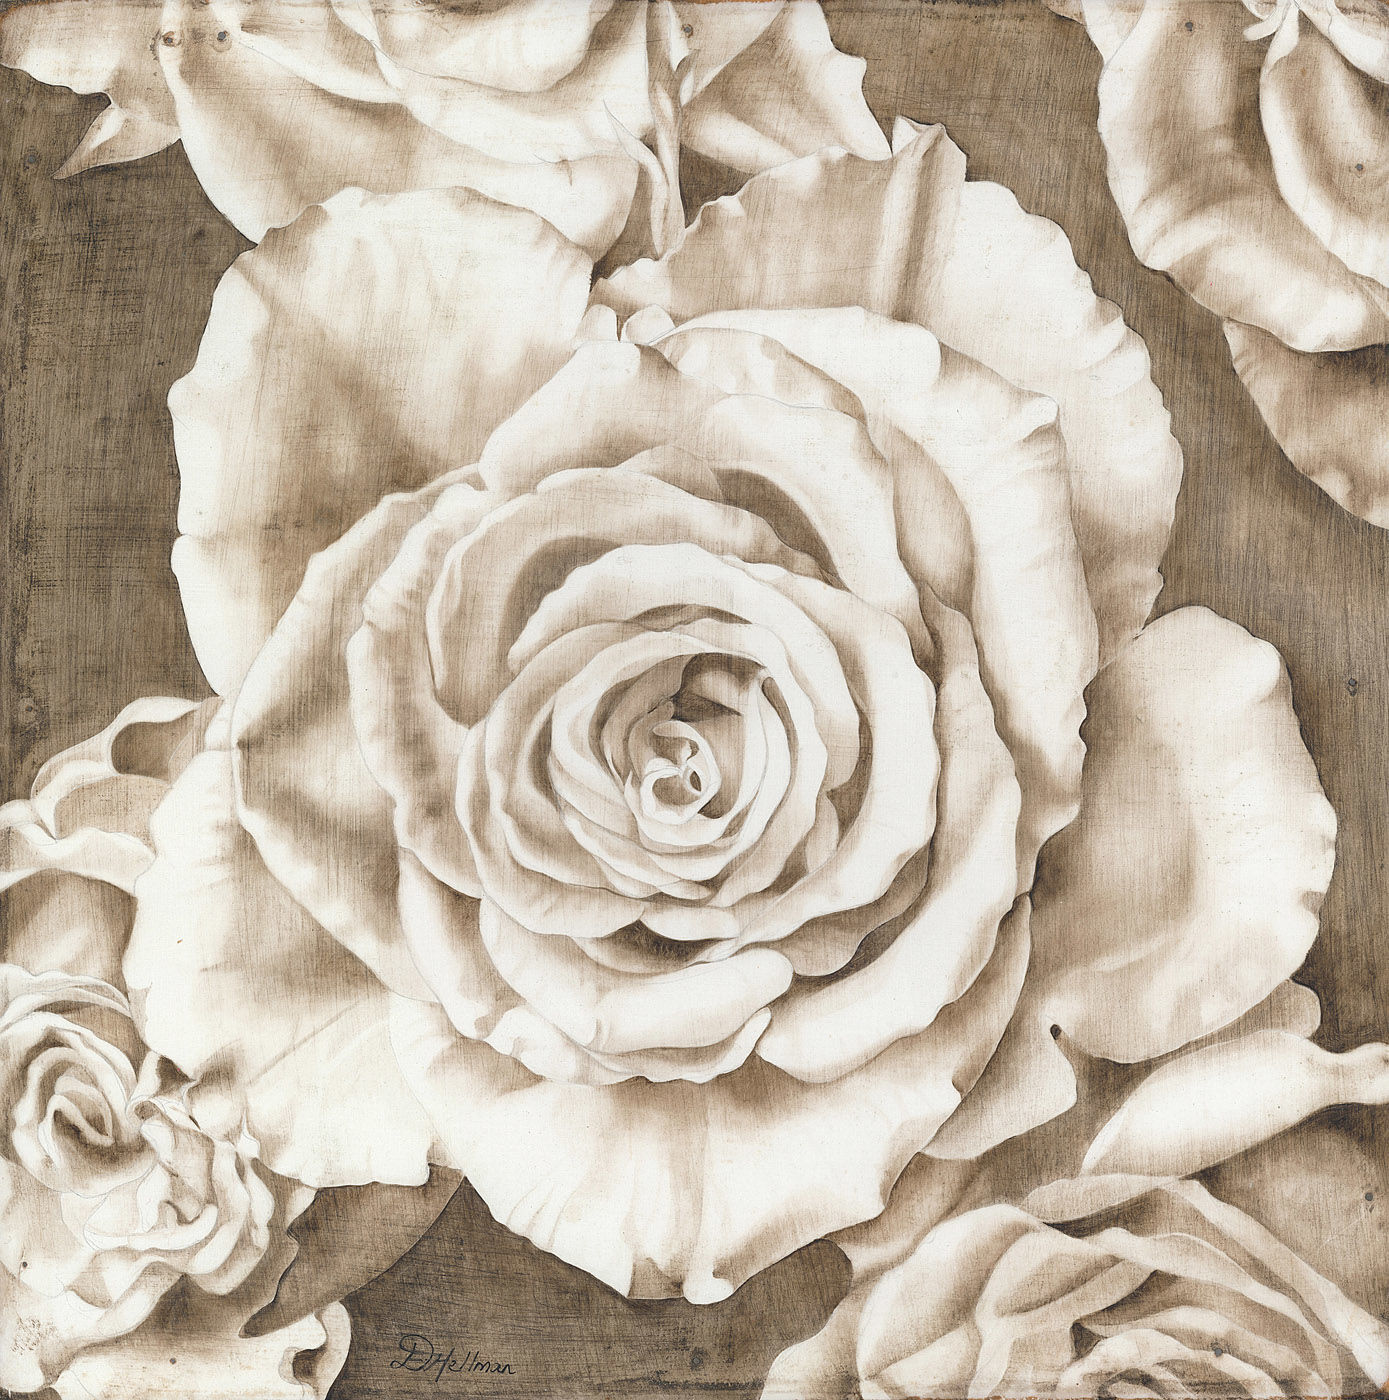 Sepia roses 2